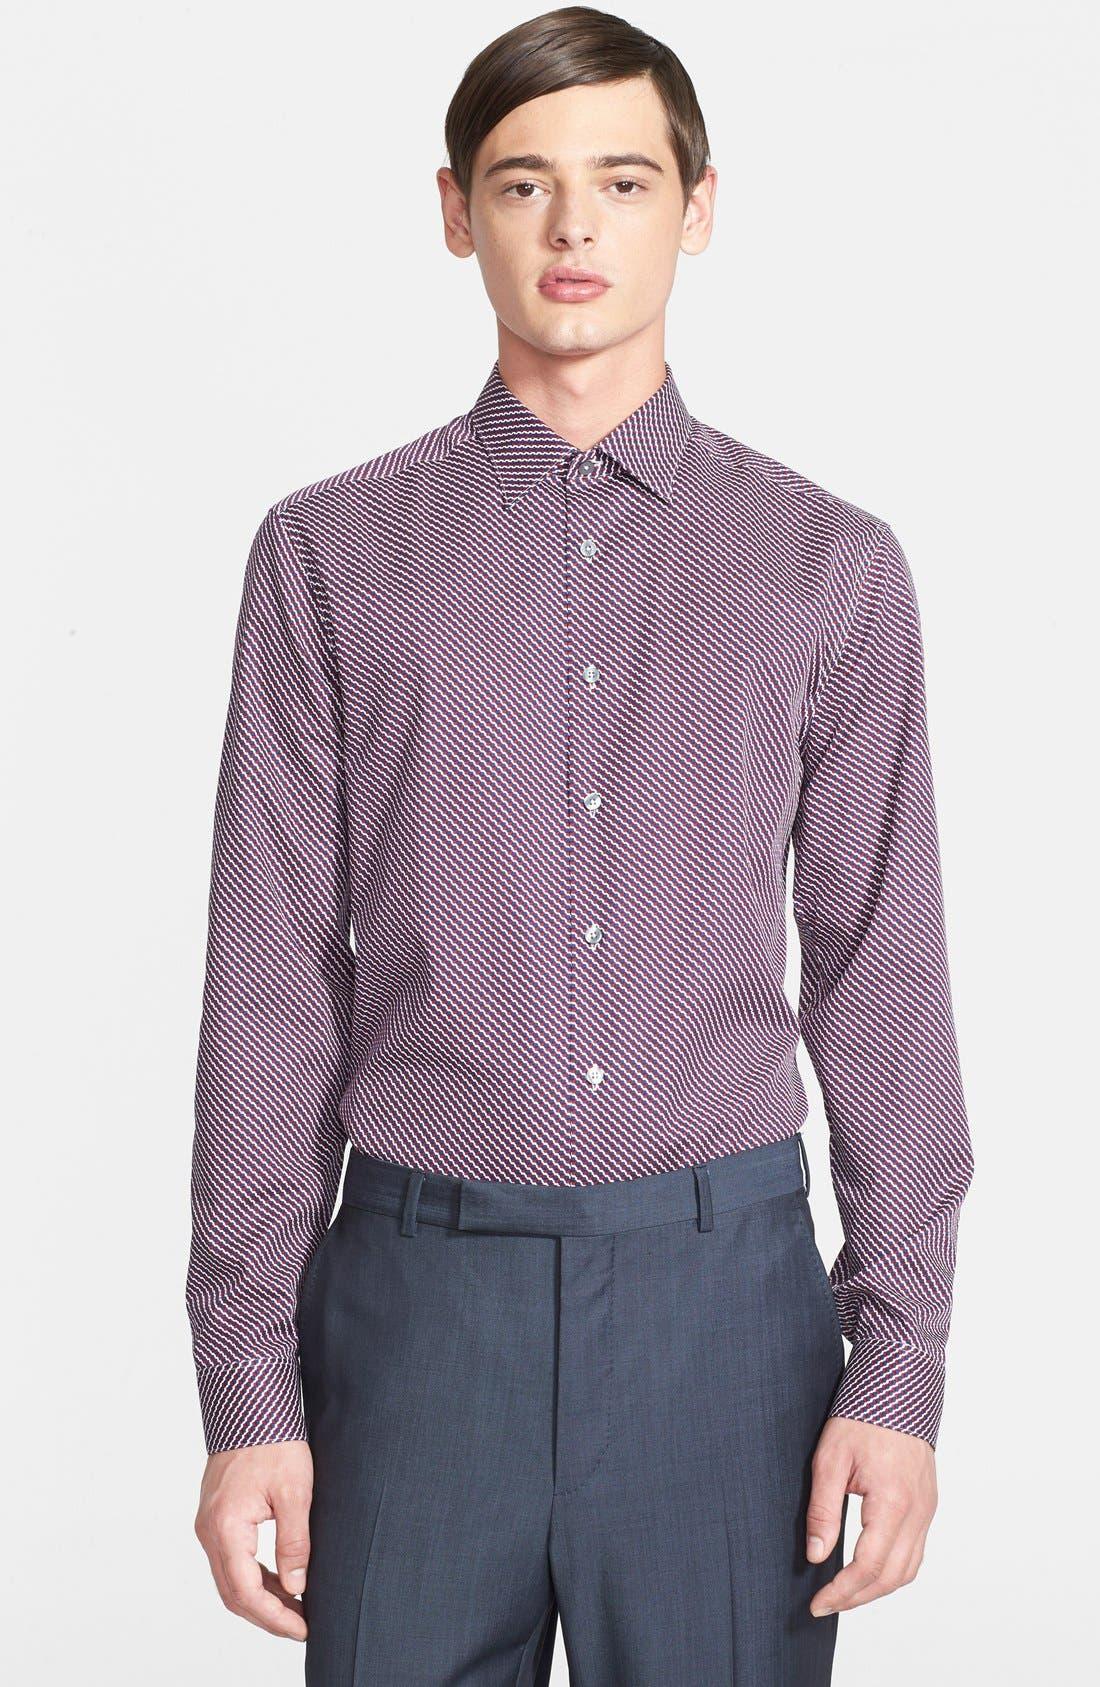 Alternate Image 1 Selected - Paul Smith London 'Byard' Trim Fit Dot Print Dress Shirt